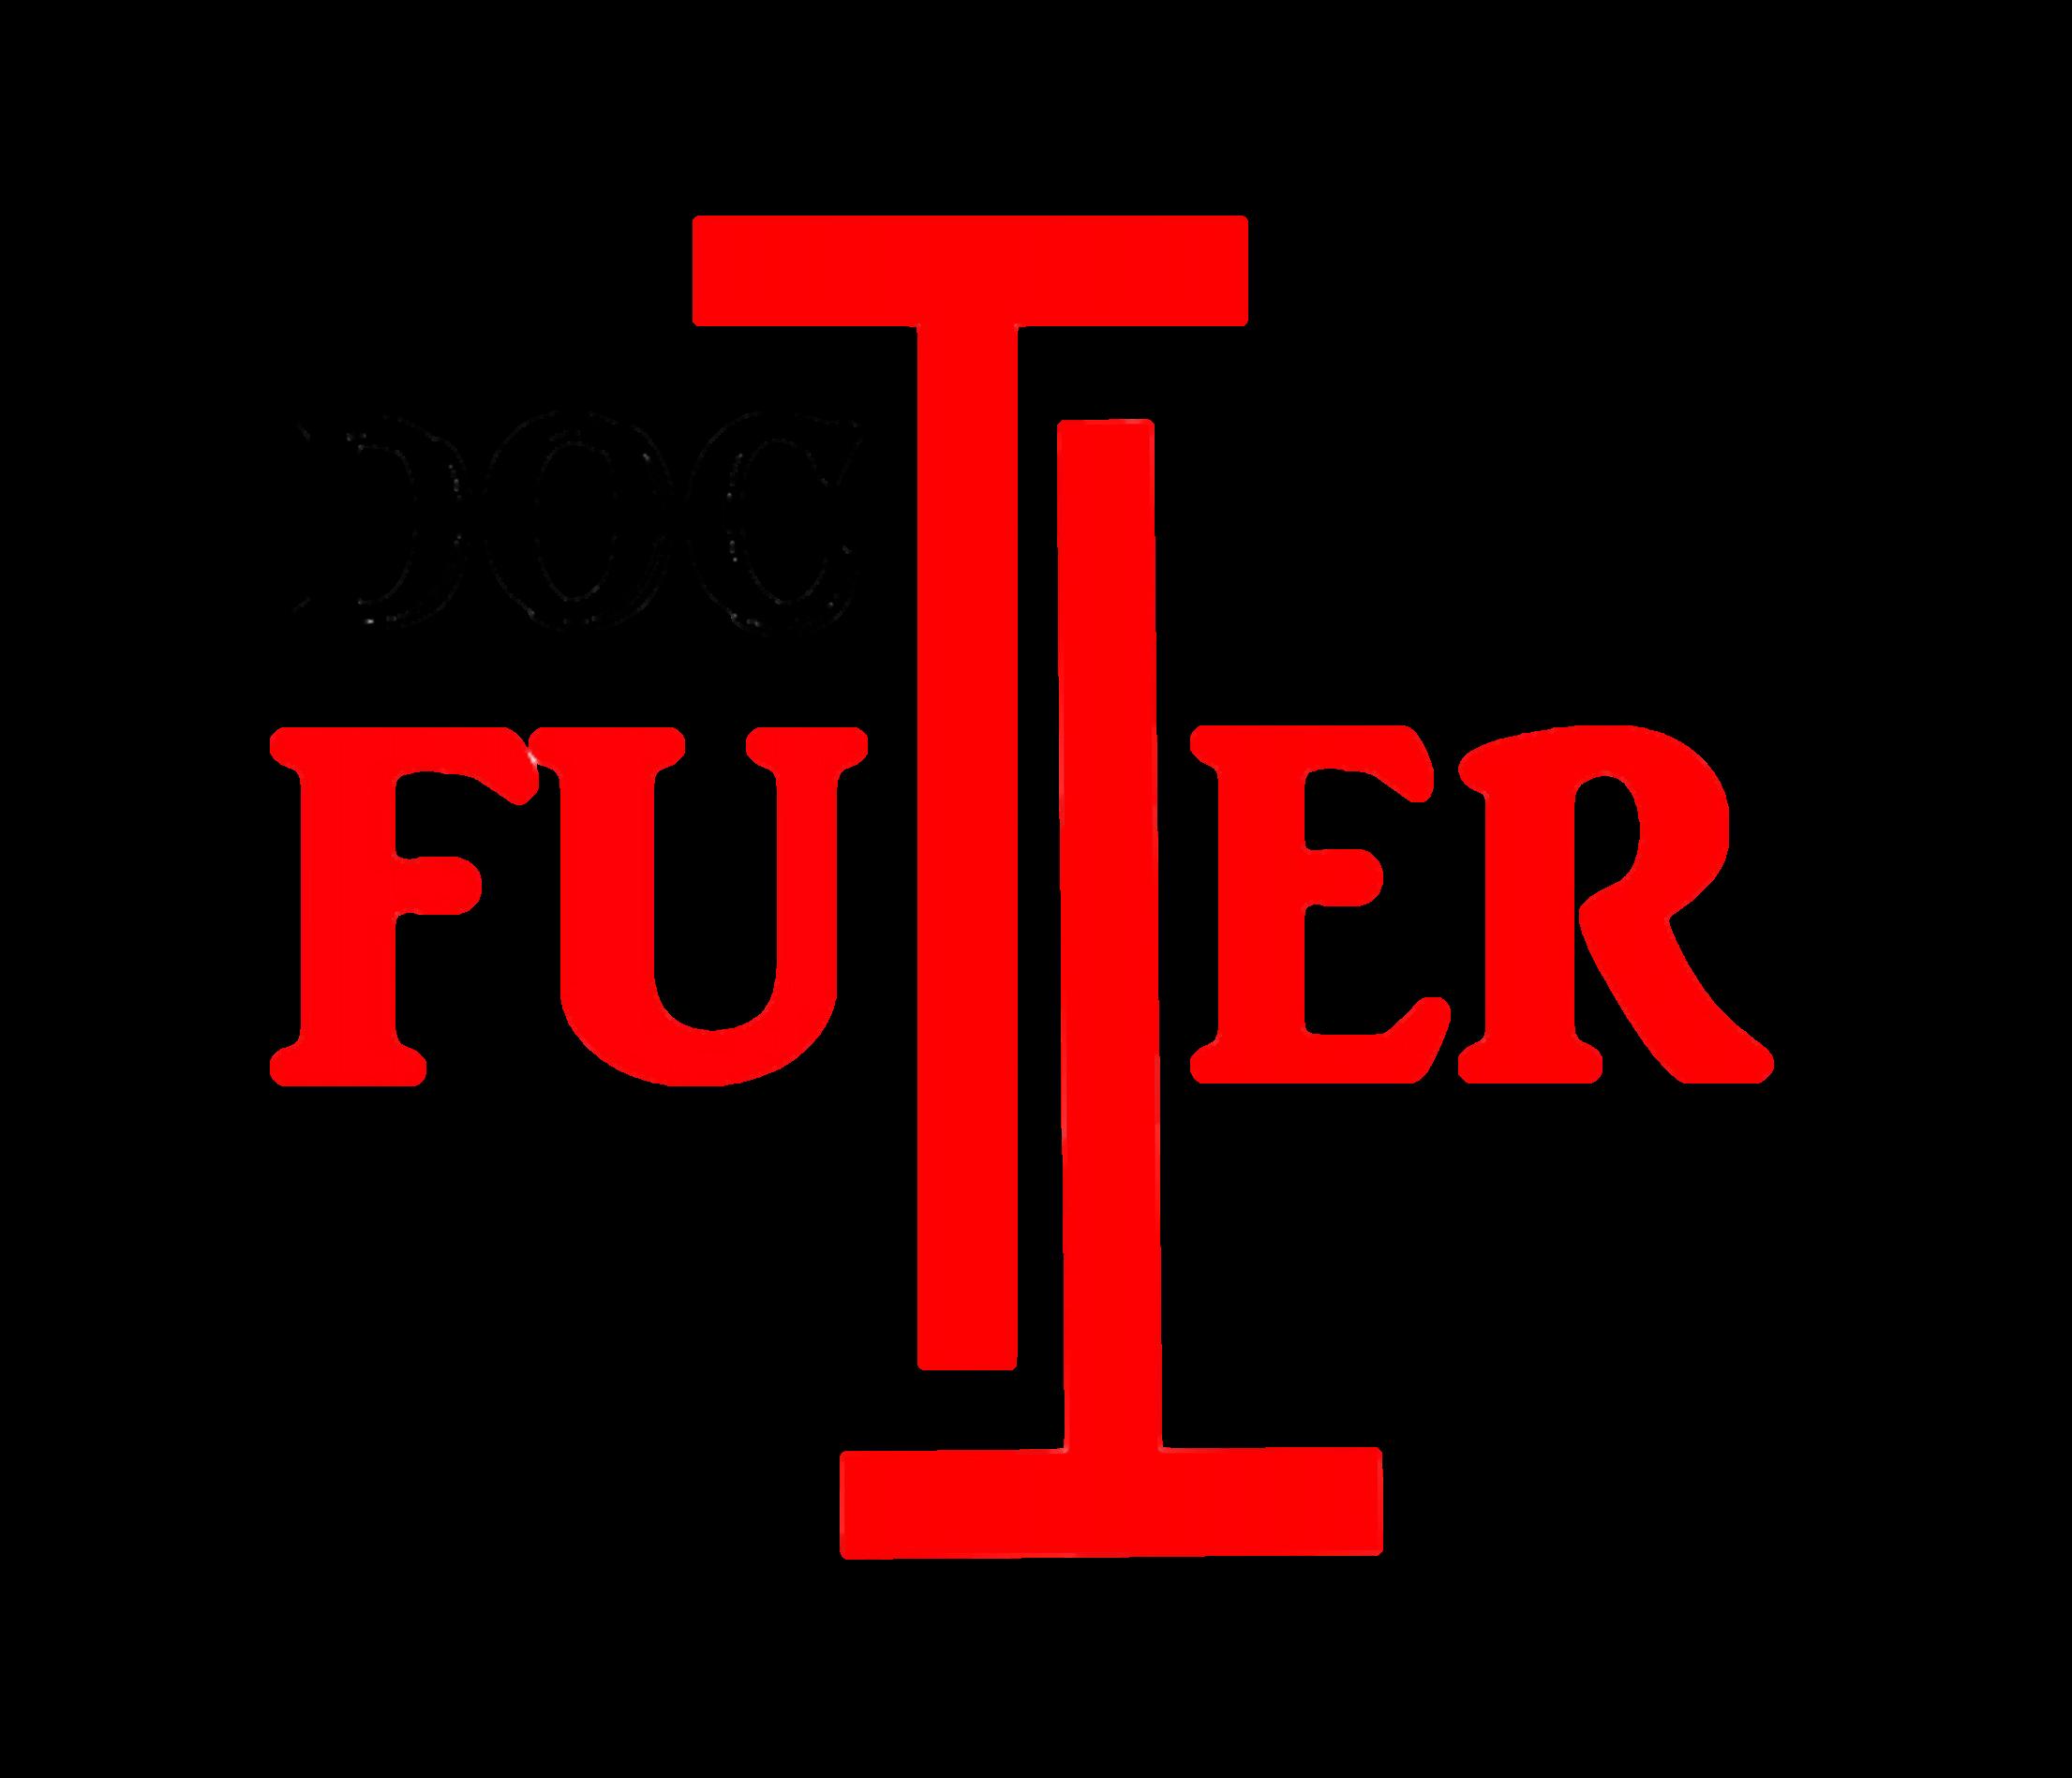 Doc-Futter